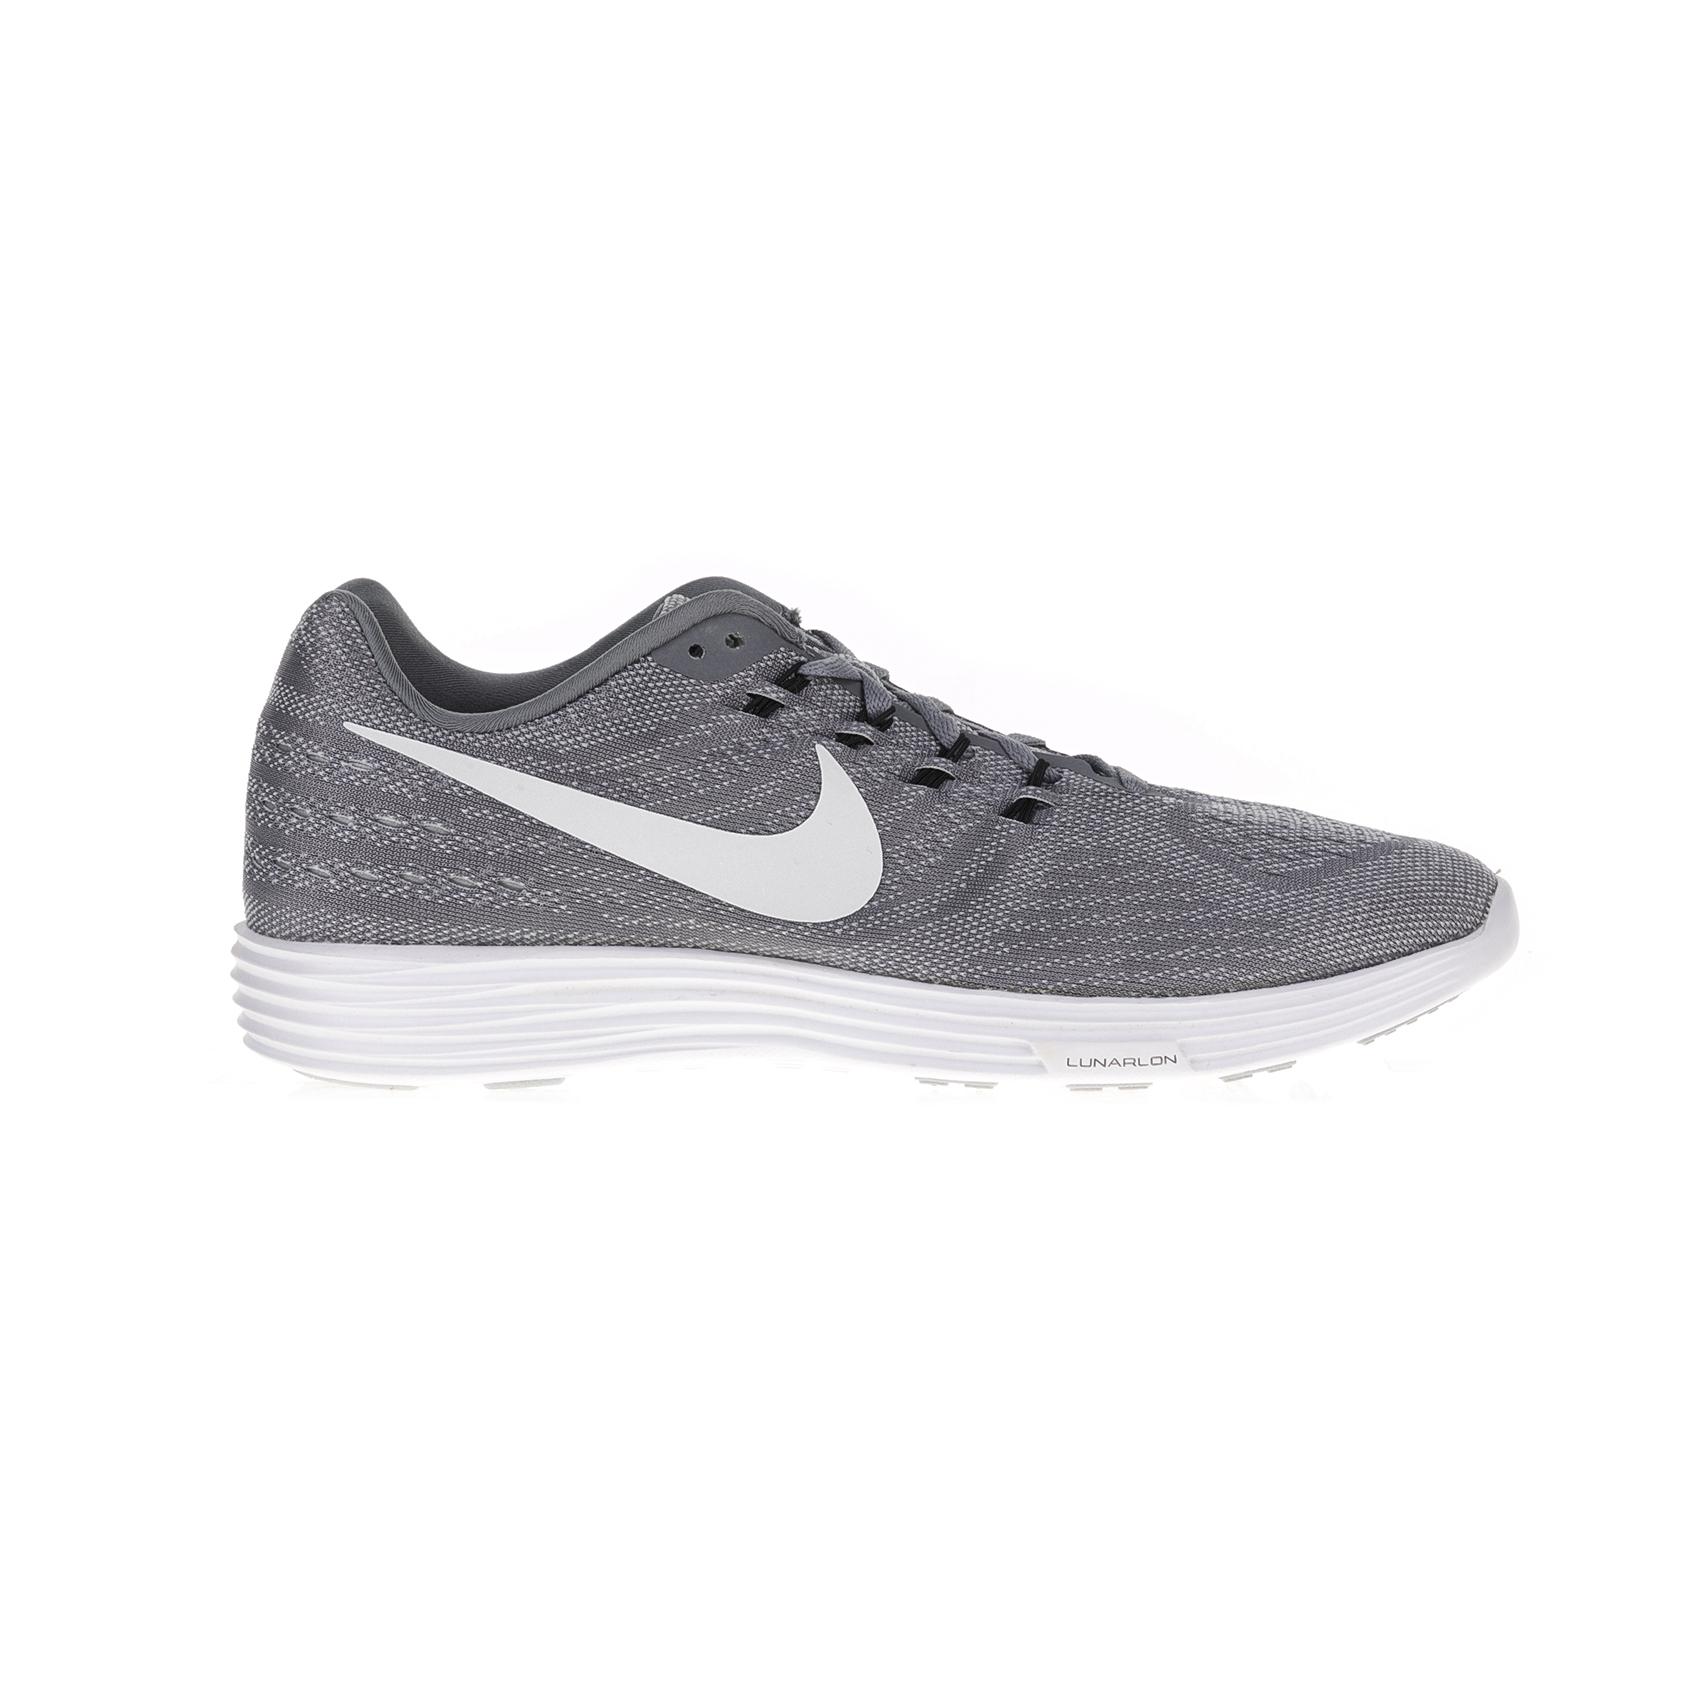 NIKE – Ανδρικά αθλητικά παπούτσια Nike LUNARTEMPO 2 γκρι